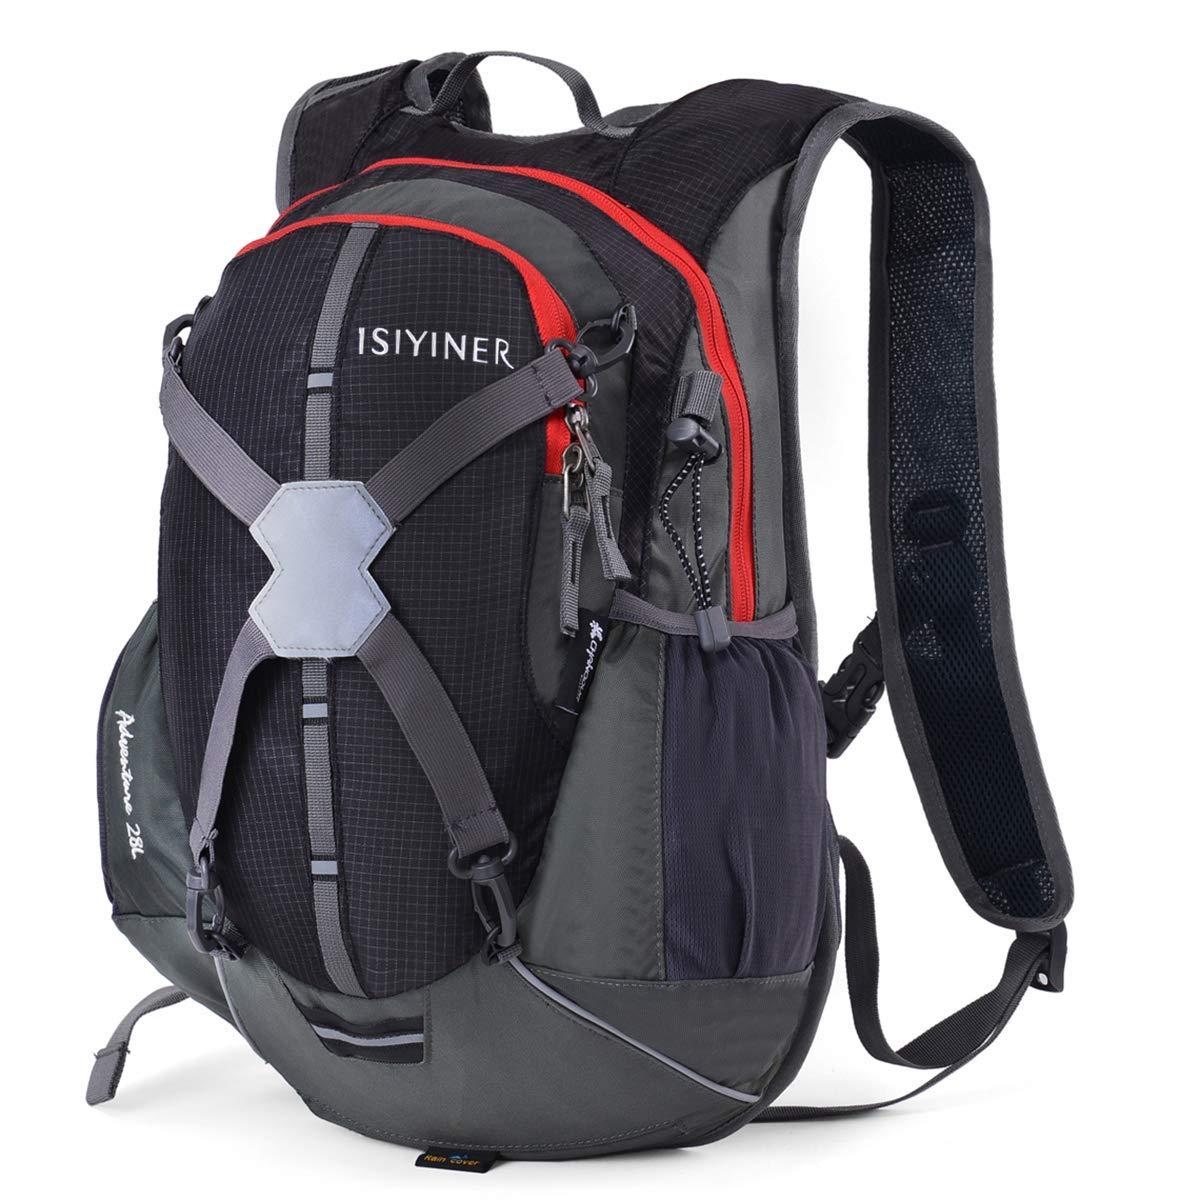 MXKJ-STORE Cycling Backpack Biking Rucksack Riding Daypack Waterproof Drinking Helmet Bag 28L for Men Women Outdoor Sports Running Hiking Camping Travelling Ultralight (Black) [並行輸入品] B07R3YB4WD